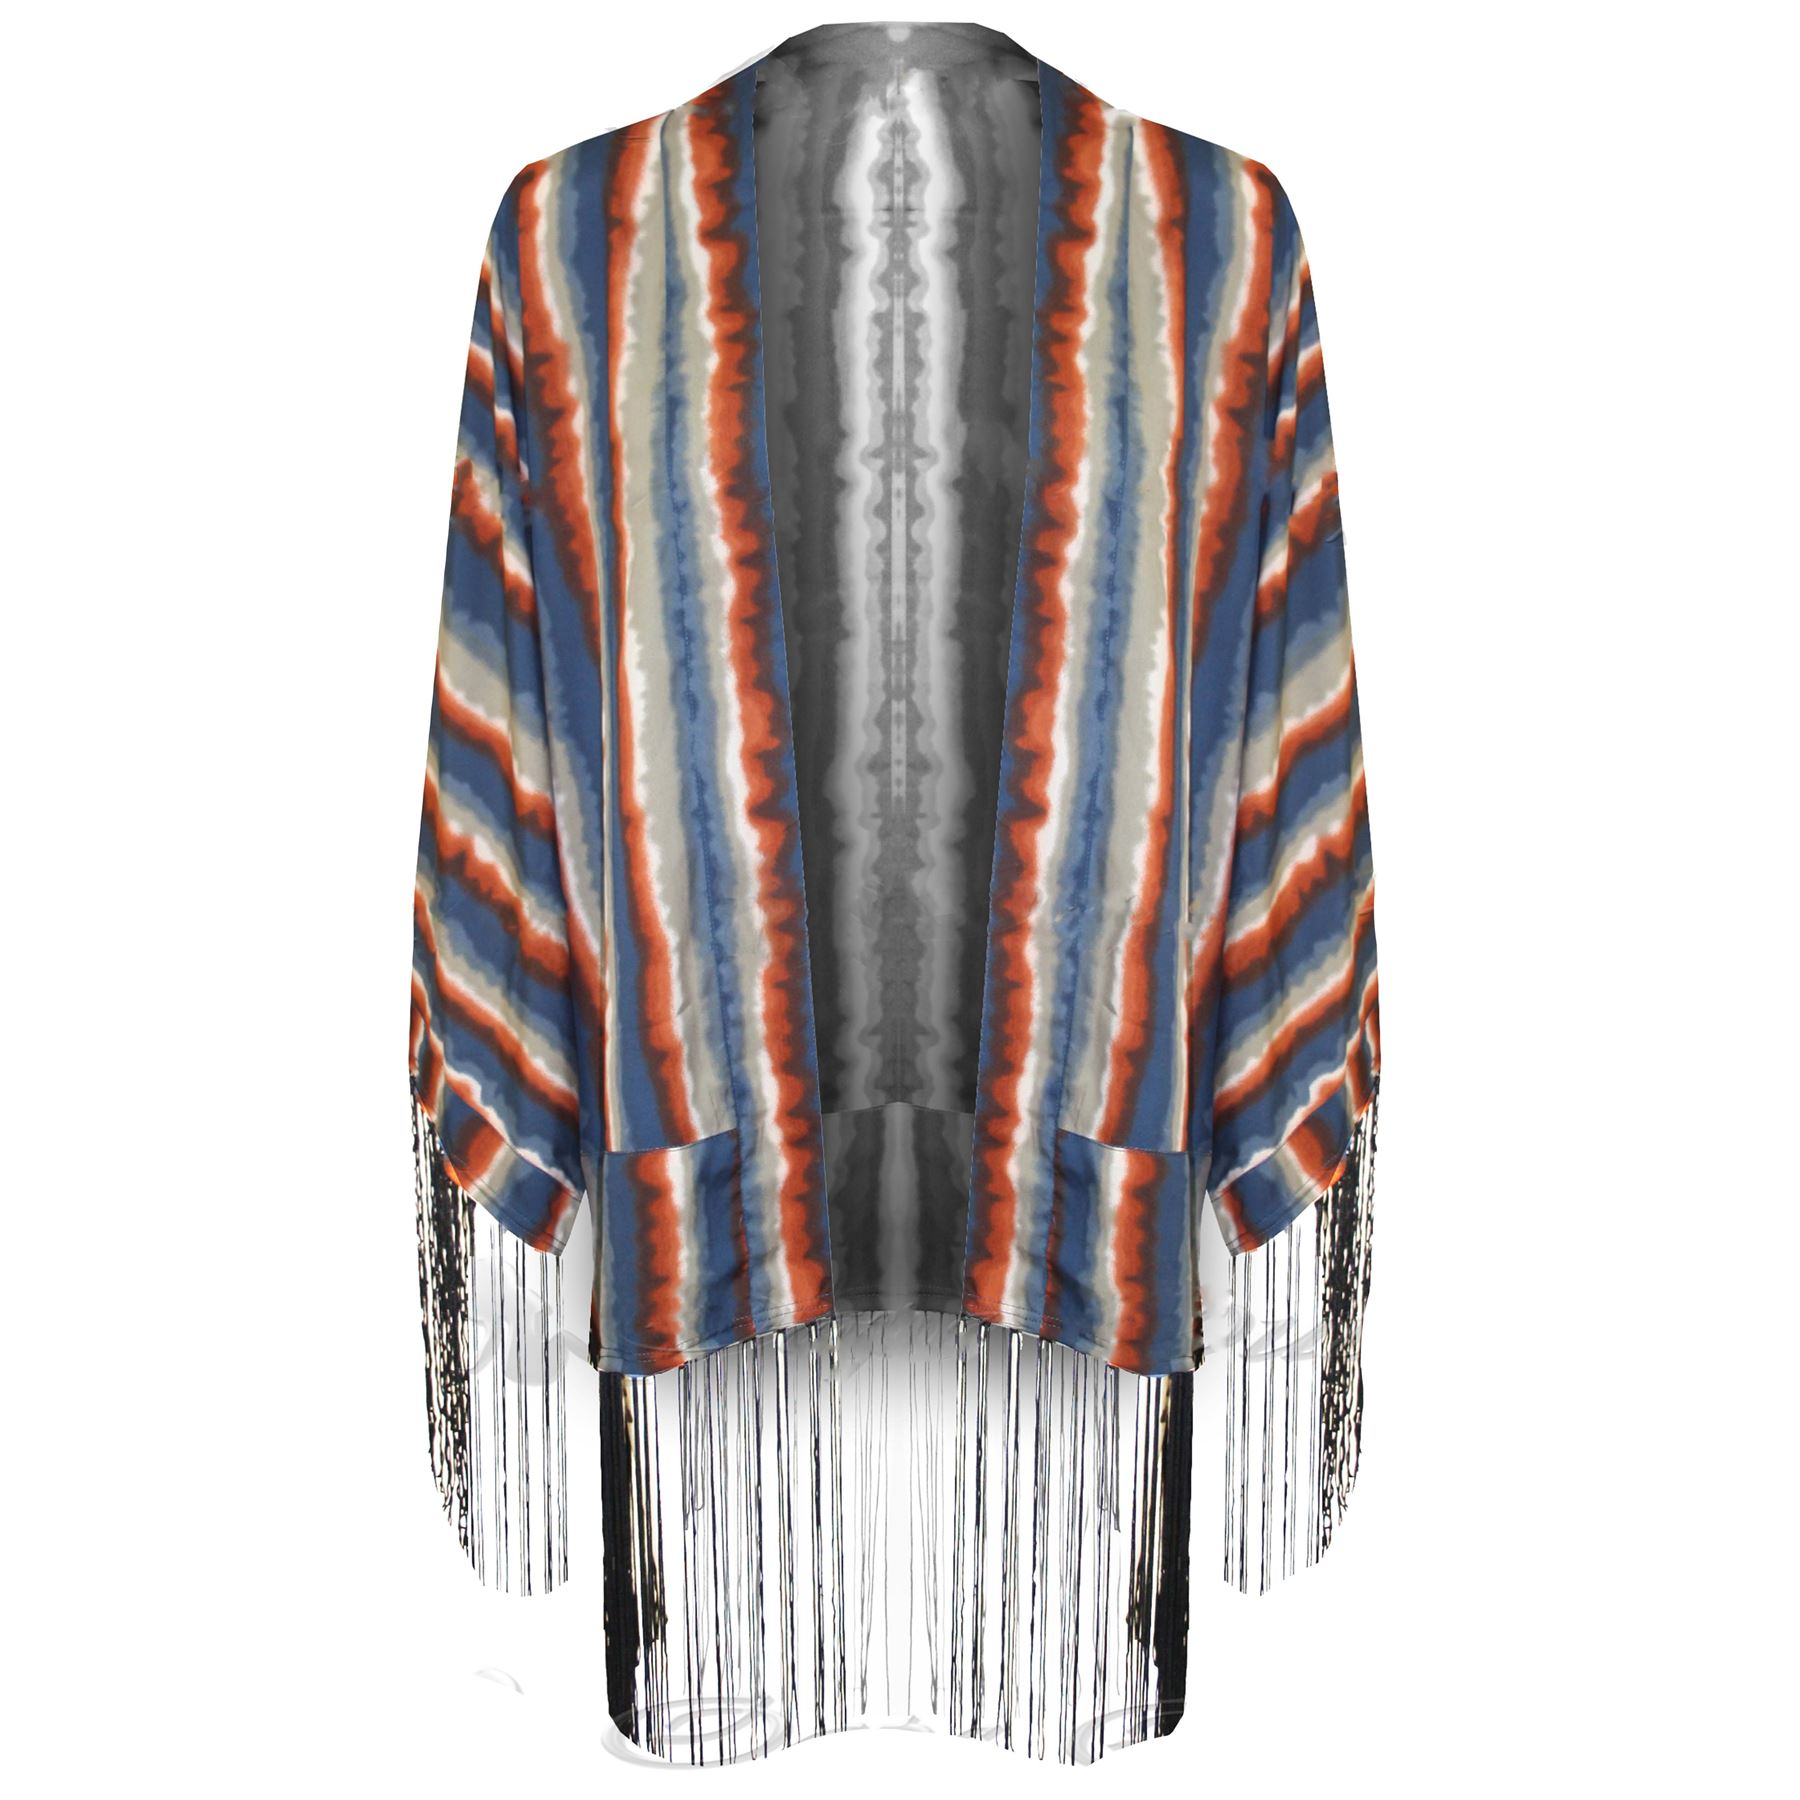 Pour-femme-kimono-coupe-ample-vintage-retro-hippie-manteau-retro-veste-blazer-top